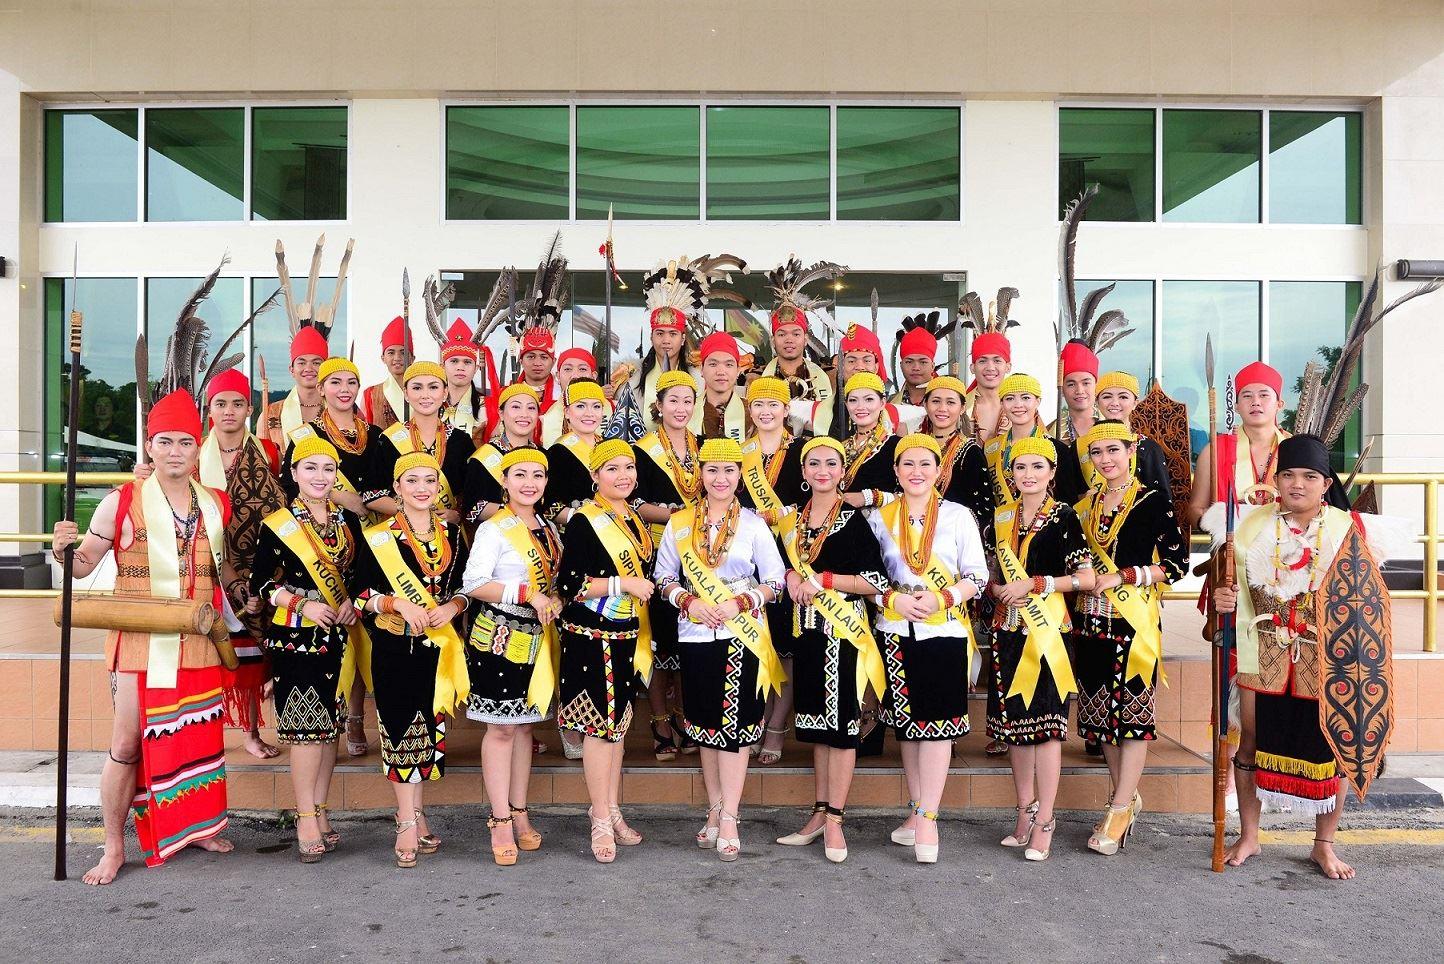 authentic, culture, dayak, Ethnic, heritage, indigenous, Irau Aco Festival, Lawas, Limbang, malaysia, native, Padan Liu Burung, Ruran Ulung, Event, Tourism, traditional, travel guide, tribal,